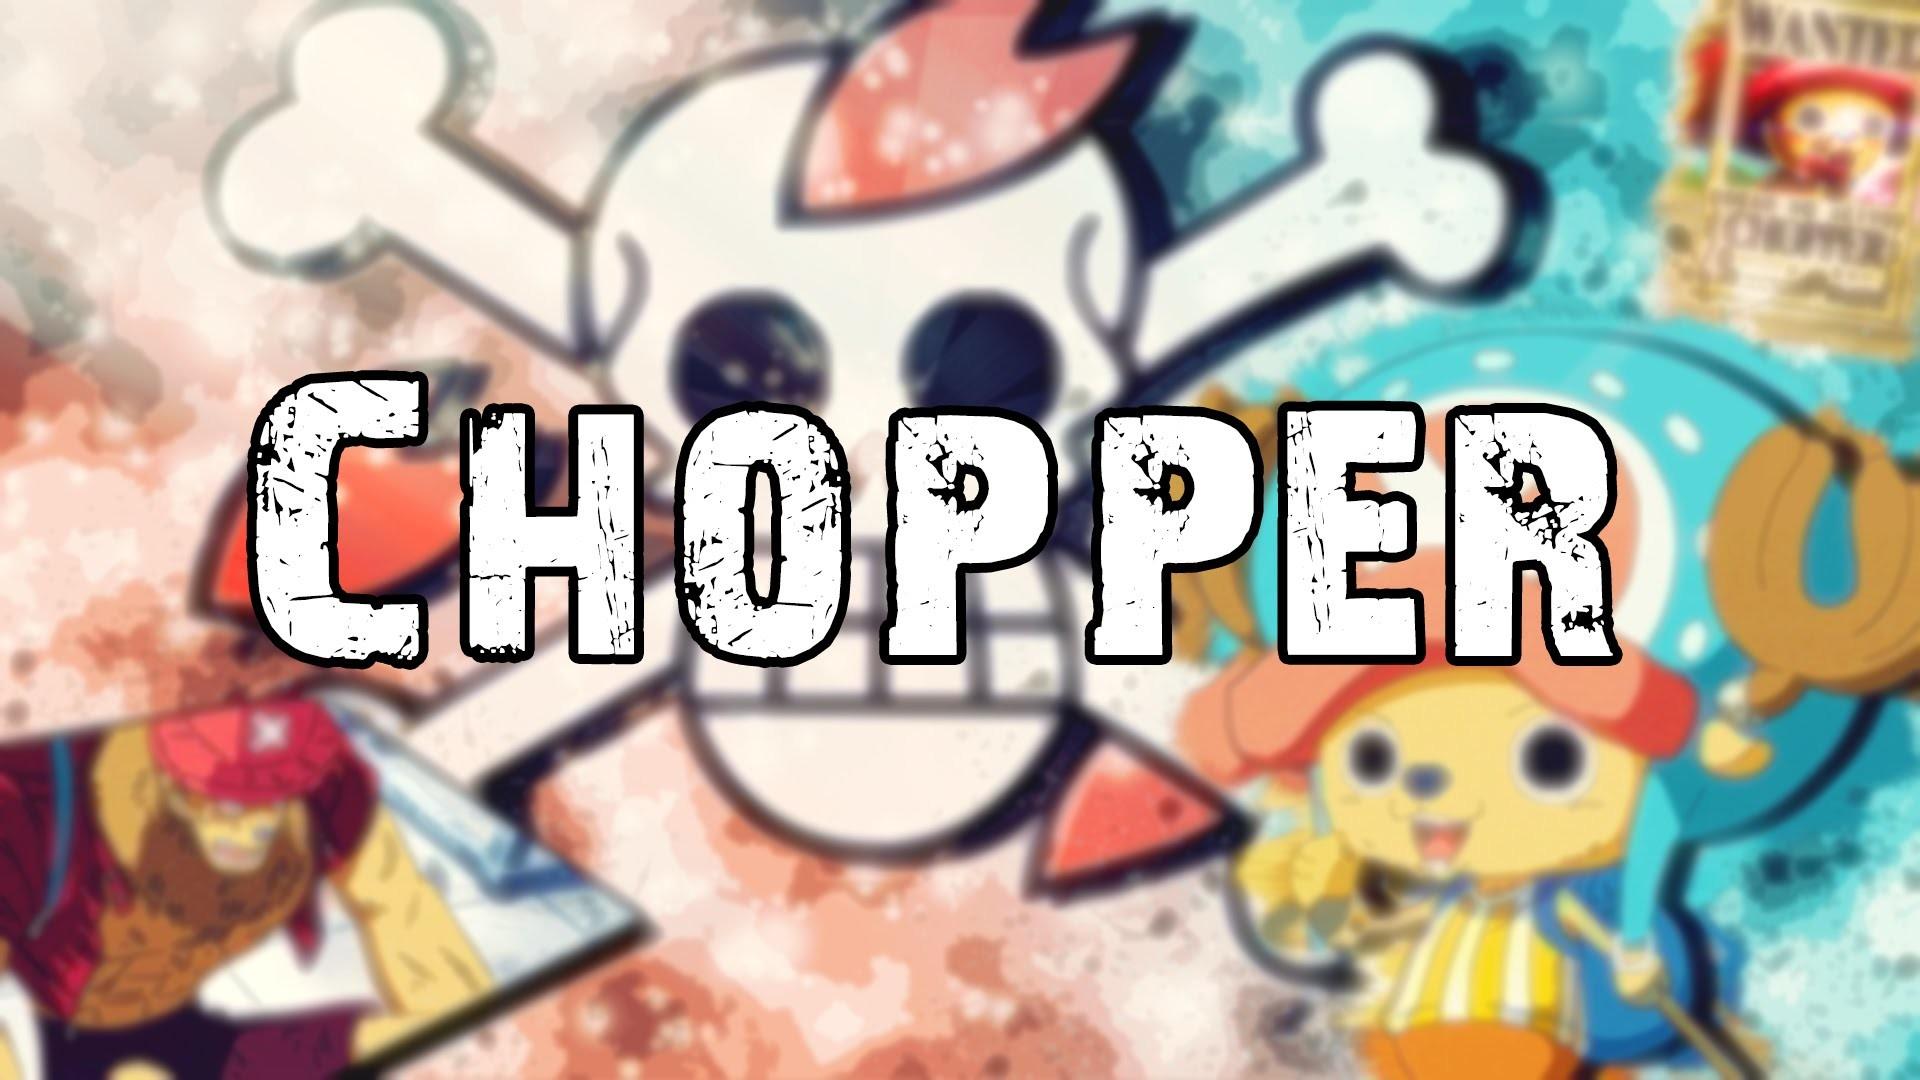 Wallpaper | Chopper | Photoshop | Speed Art | One Piece